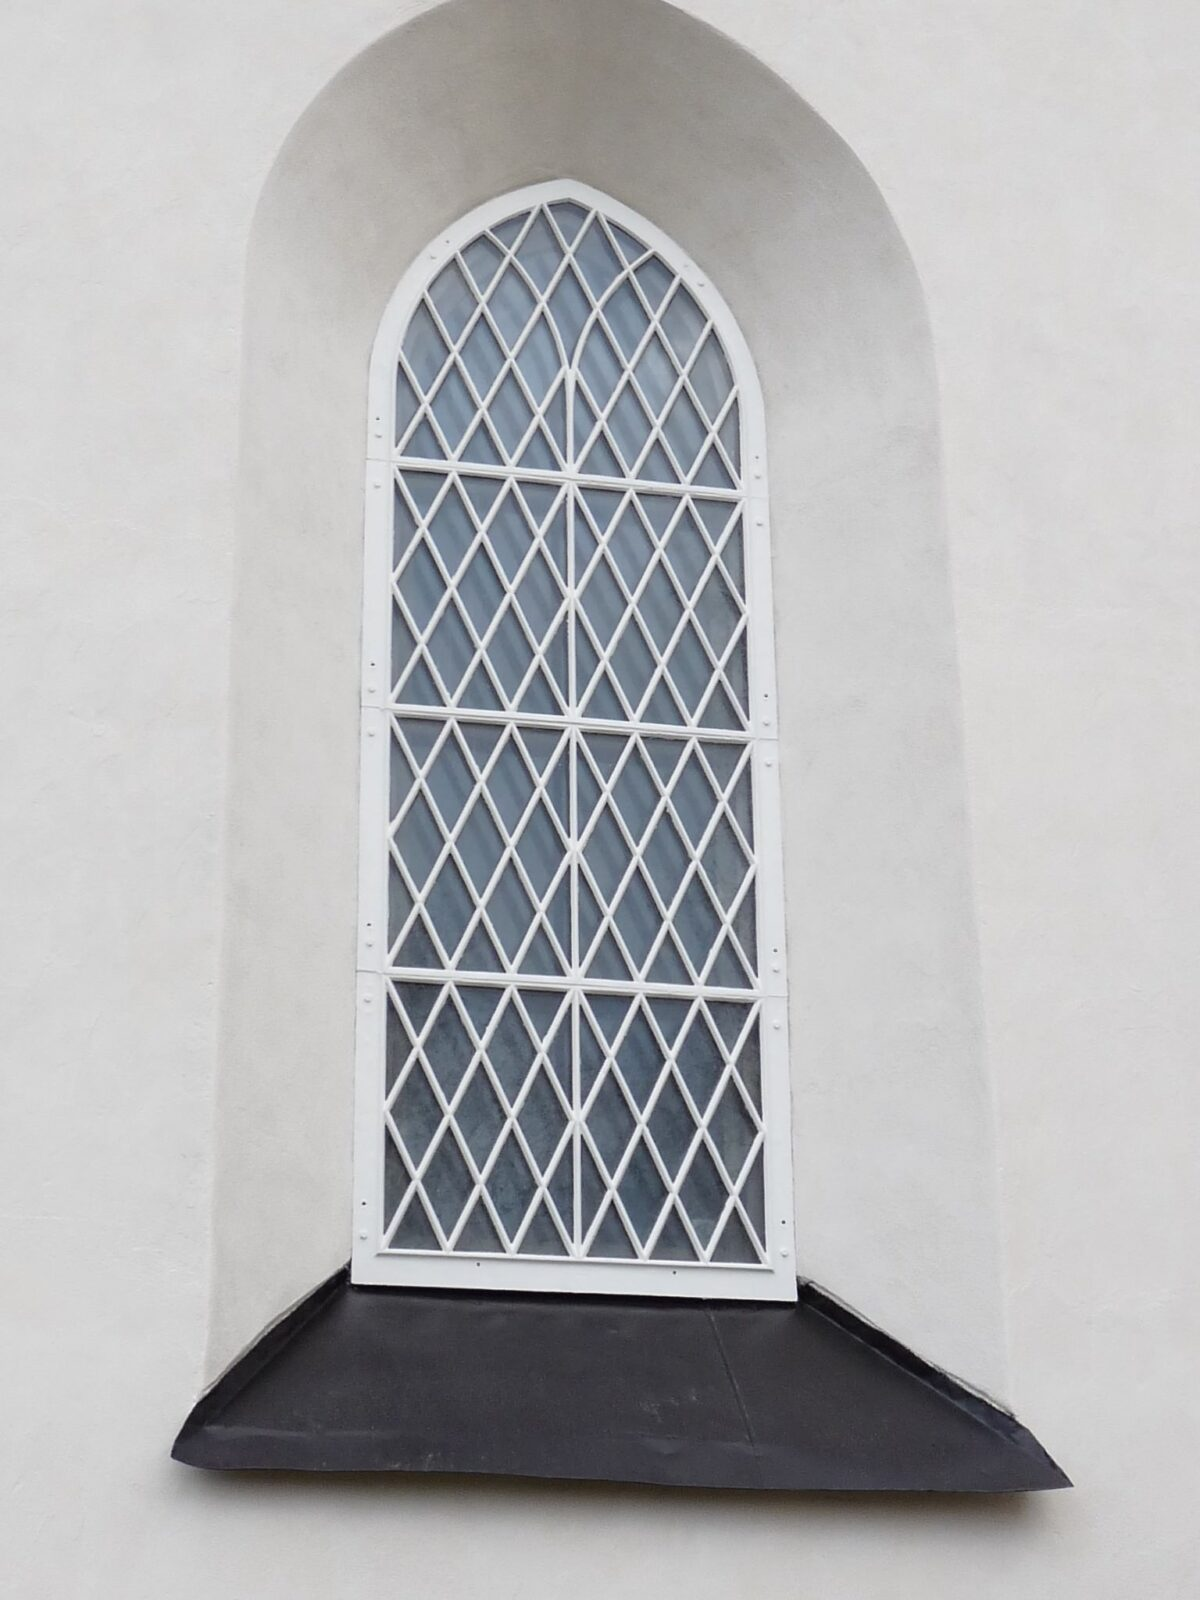 Askeby kyrka-P1030268-e1352223201352